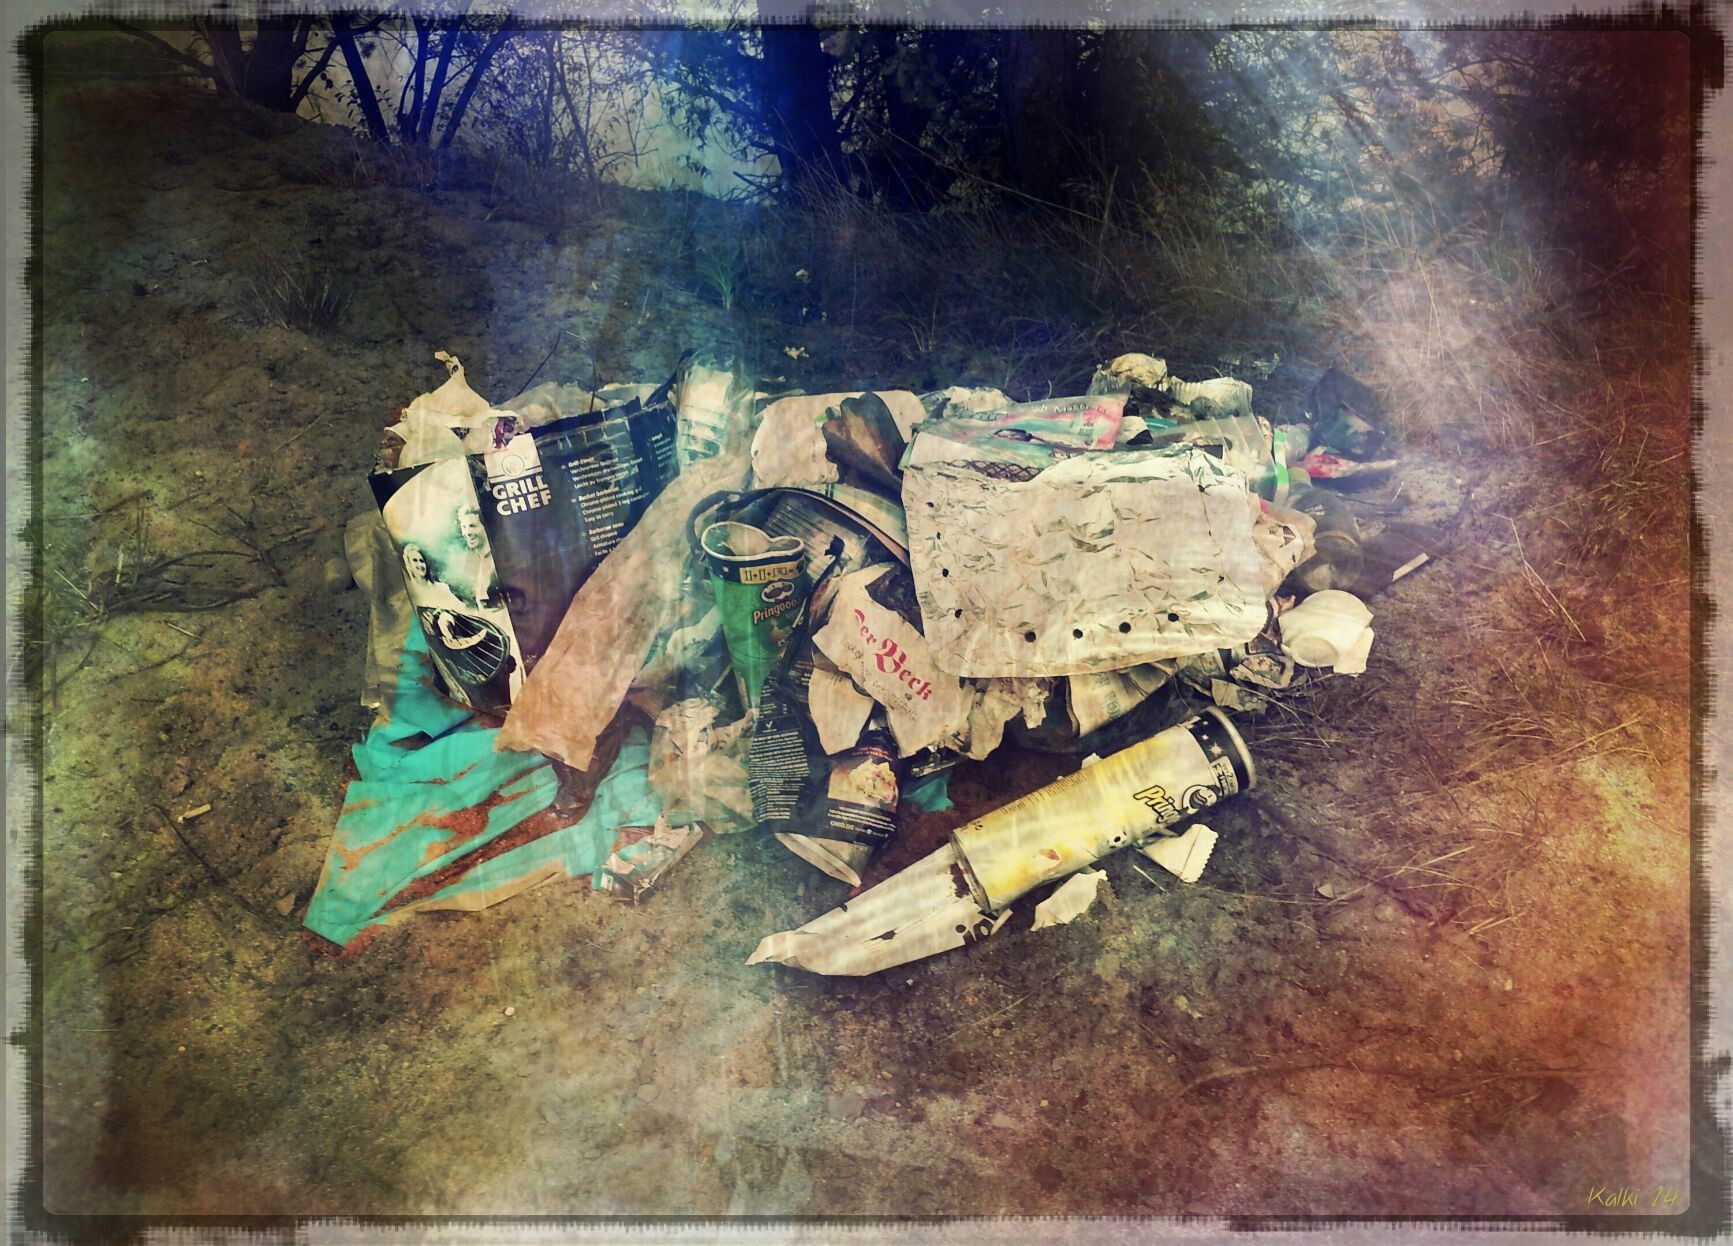 TITEL: Het afval in het bos! ...... LOCATION: Baggersee Erlangen Germany..... ©Copyright by Kalki Kalkbrenner™